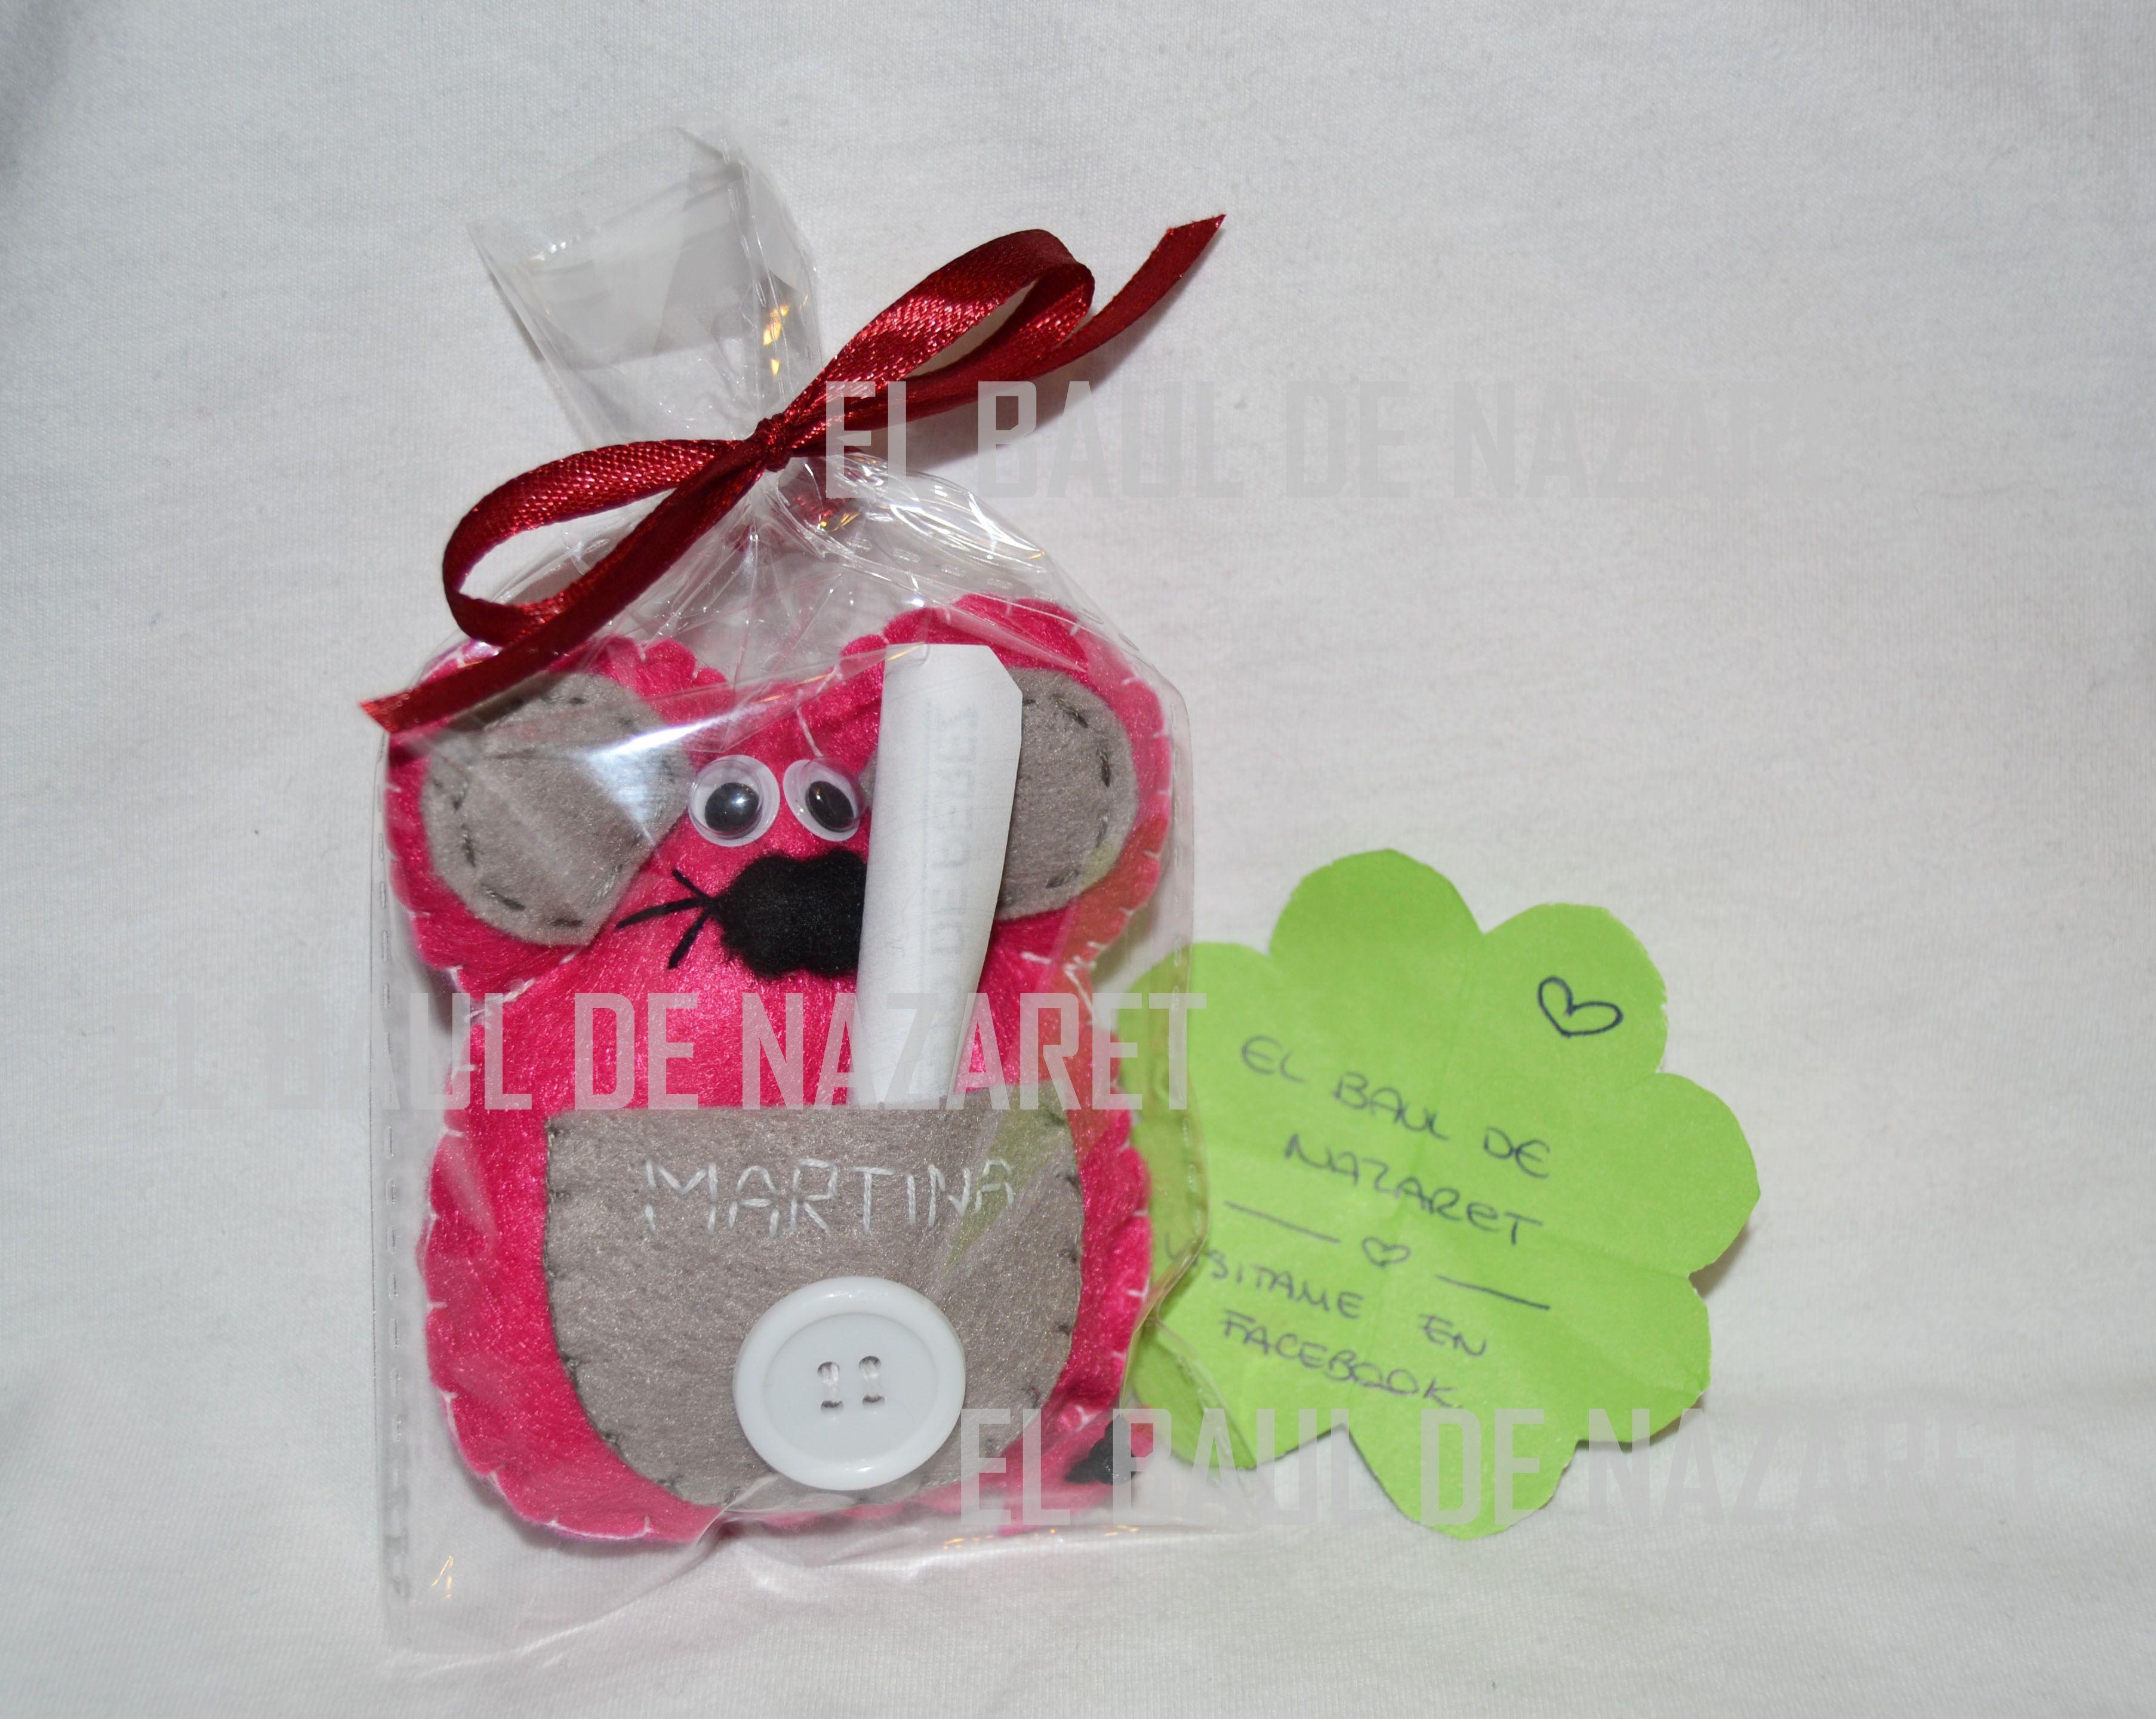 Nuevo ratoncito guardadientes para Martina, espero que os guste. Miden unos 9-10cm mas o menos.  www.facebook.com/lasideasdenaza  gracias!!!